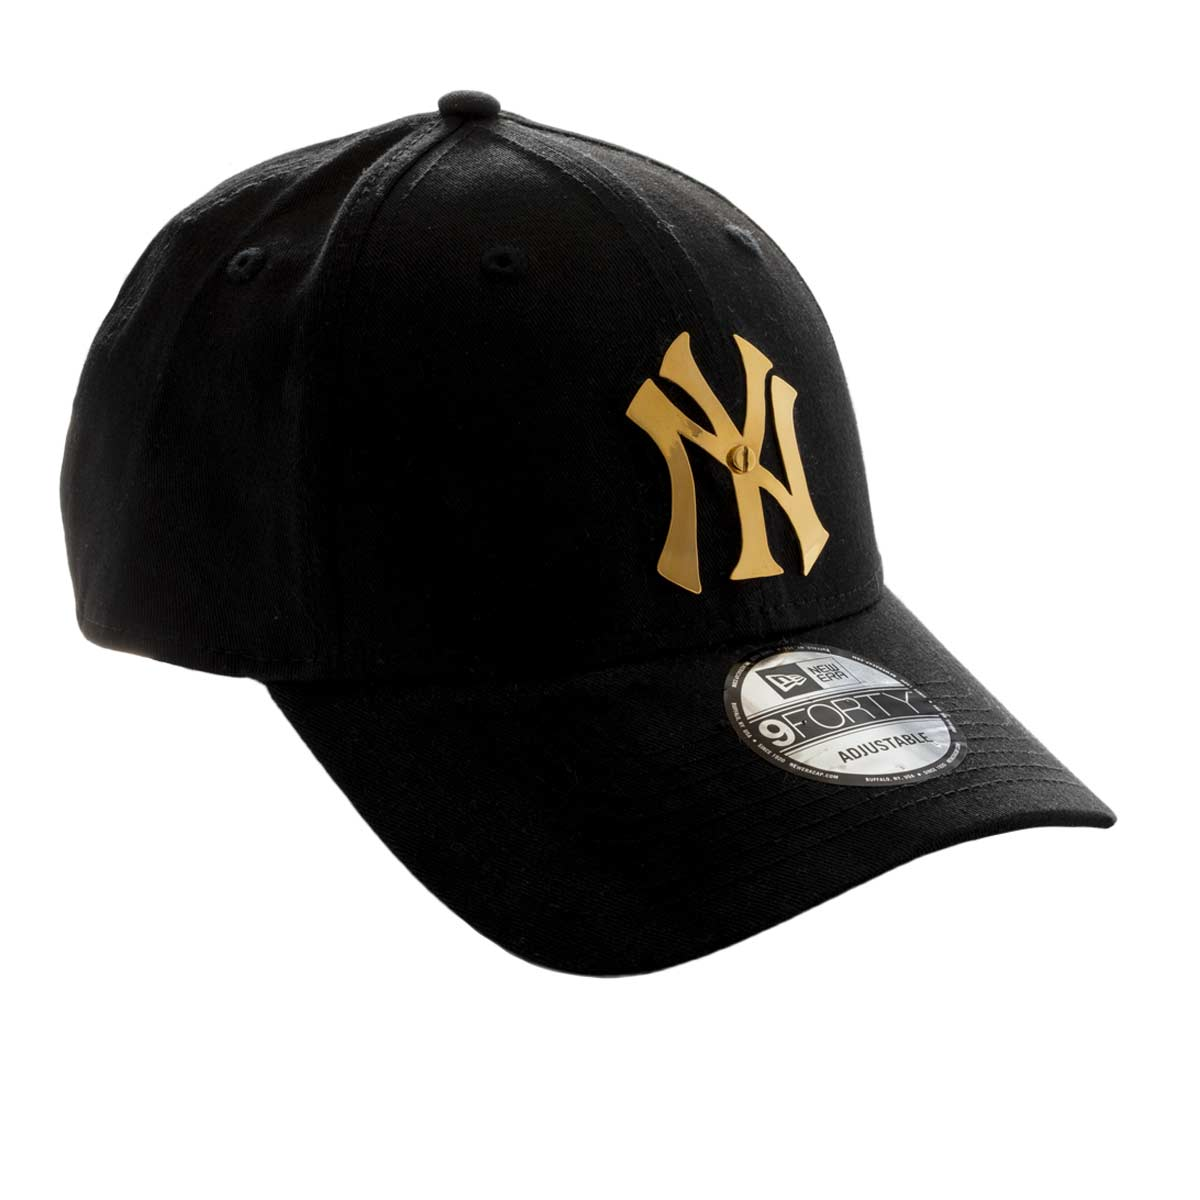 Elite Luxury New York Yankees Cap-Black-Gold